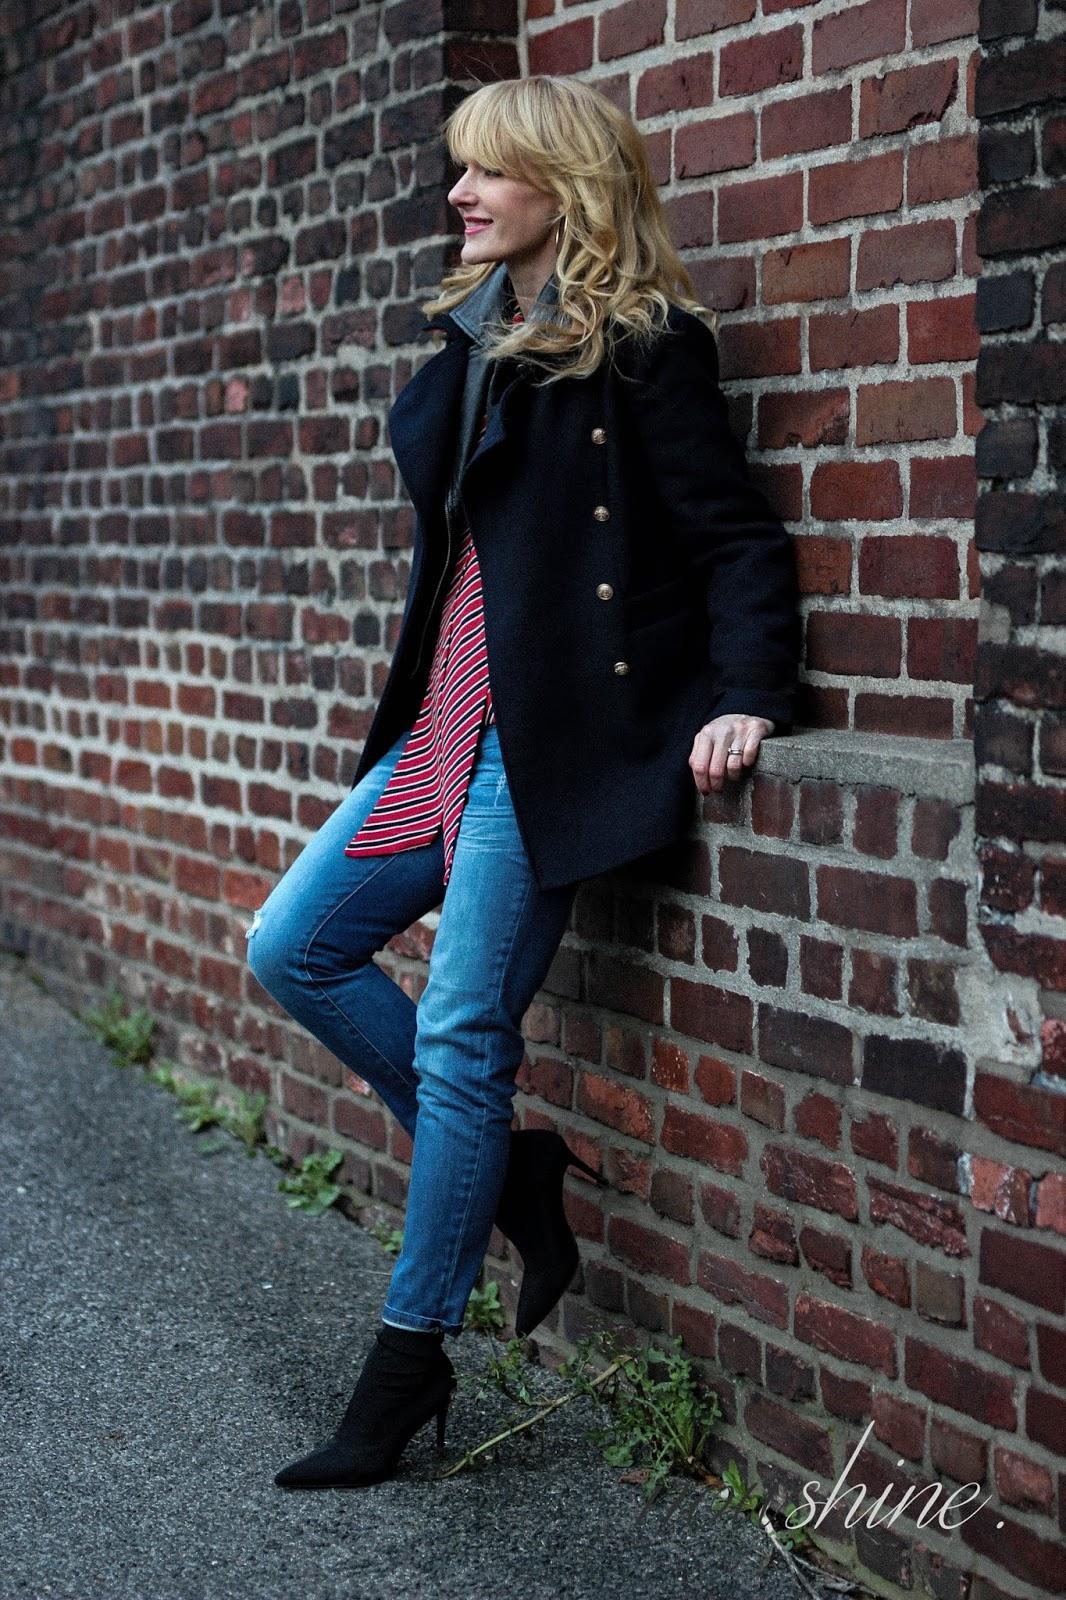 Nowshine trägt Lederjacke unter Winterjacke ü40 Mode Blog